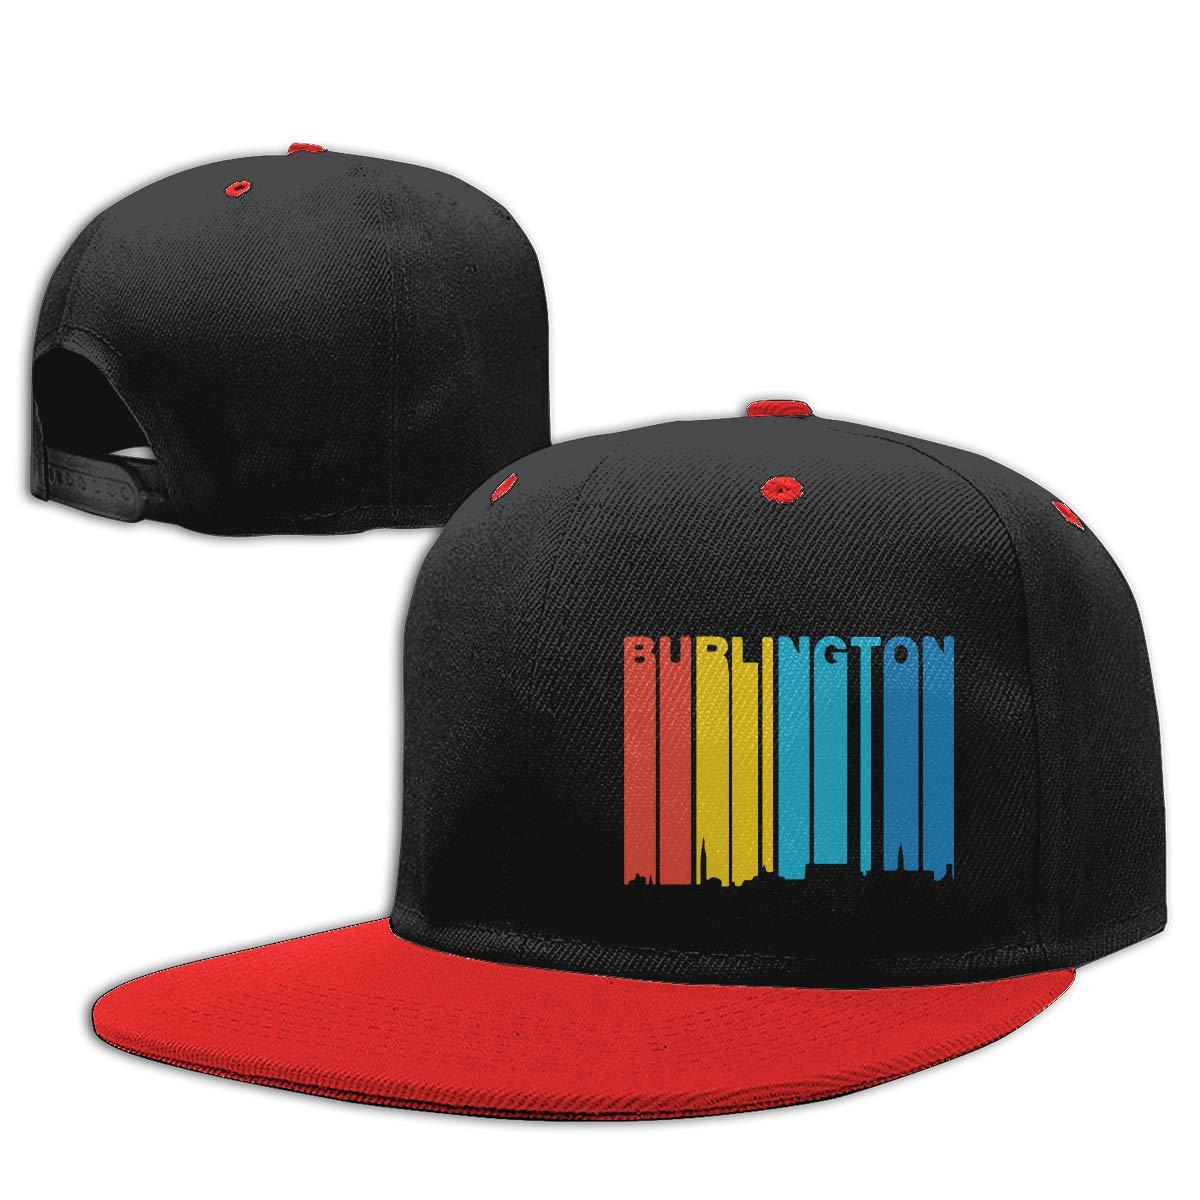 Men Womens Punk Rock Cap Retro 1970s Style Burlington Vermont Skyline Printed Hip-Hop Baseball Caps